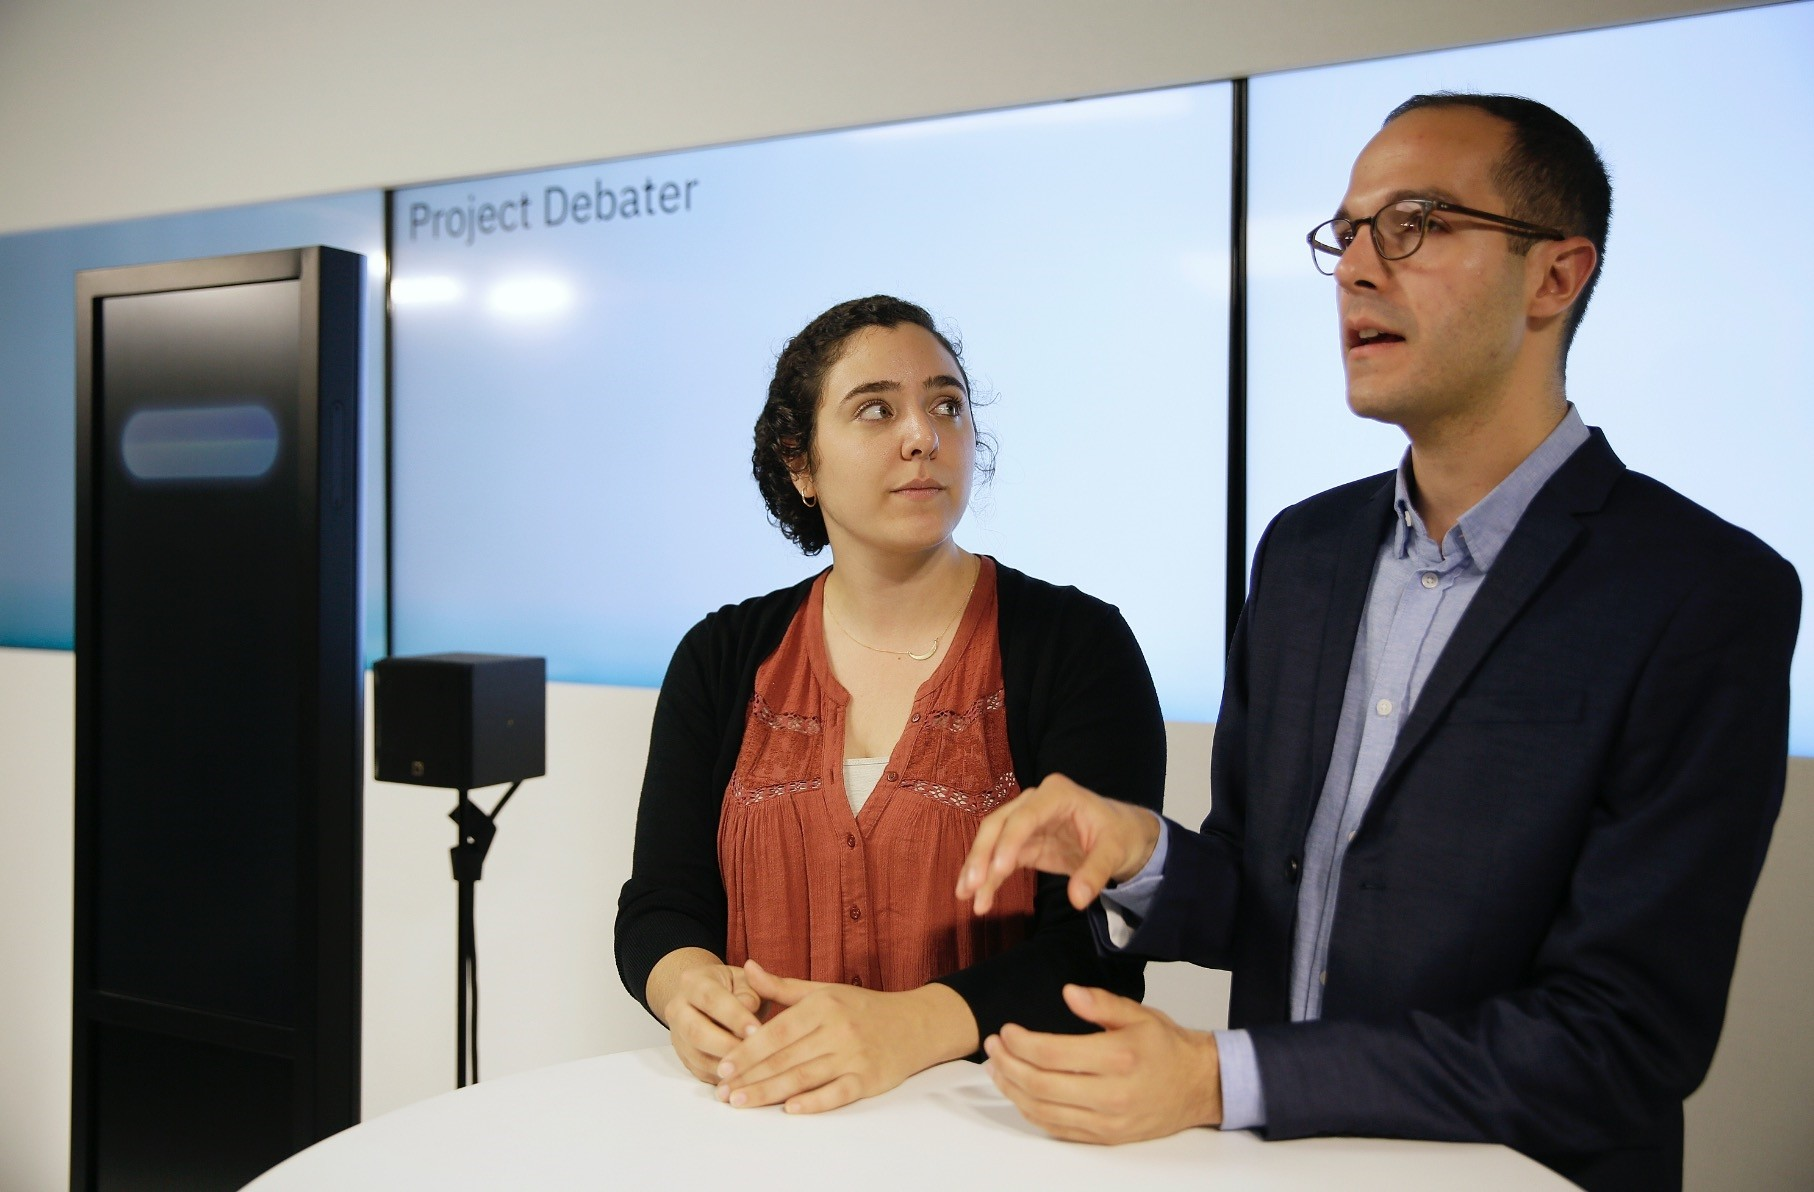 Noa Ovadia (L) and Dan Zafrir prepare for their debate against the IBM Project Debater in San Francisco, June 18.